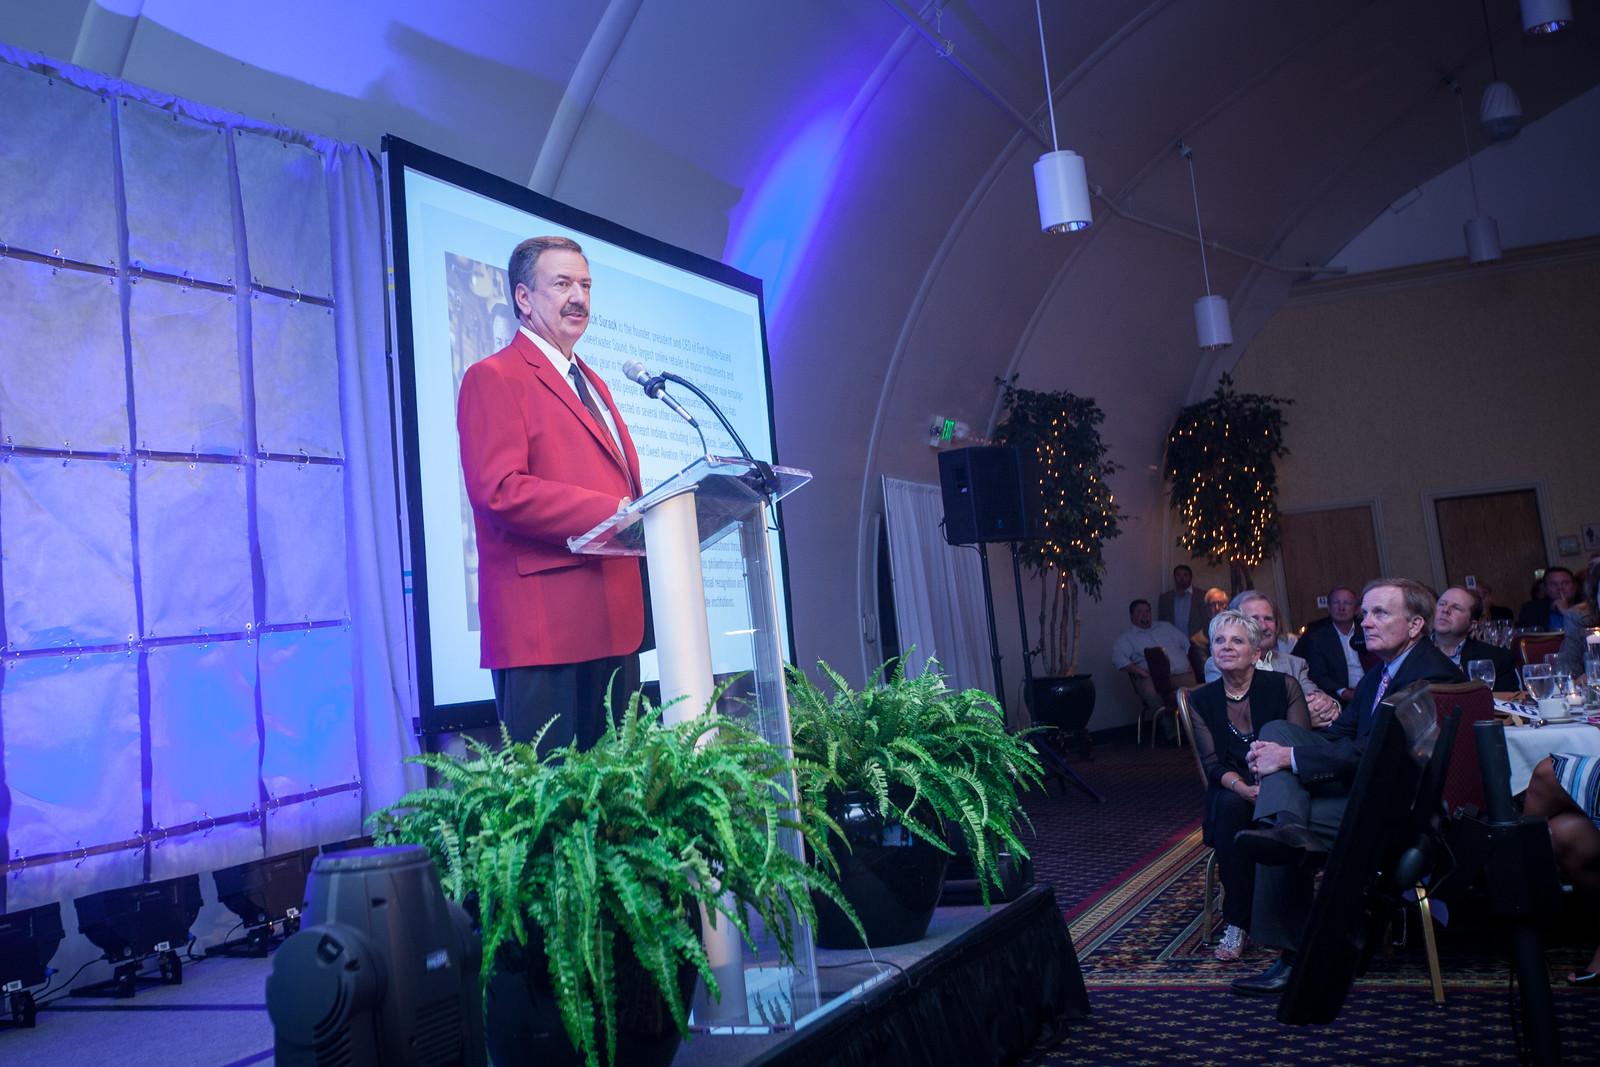 Chuck Surack, winner of this year's Red Coat.